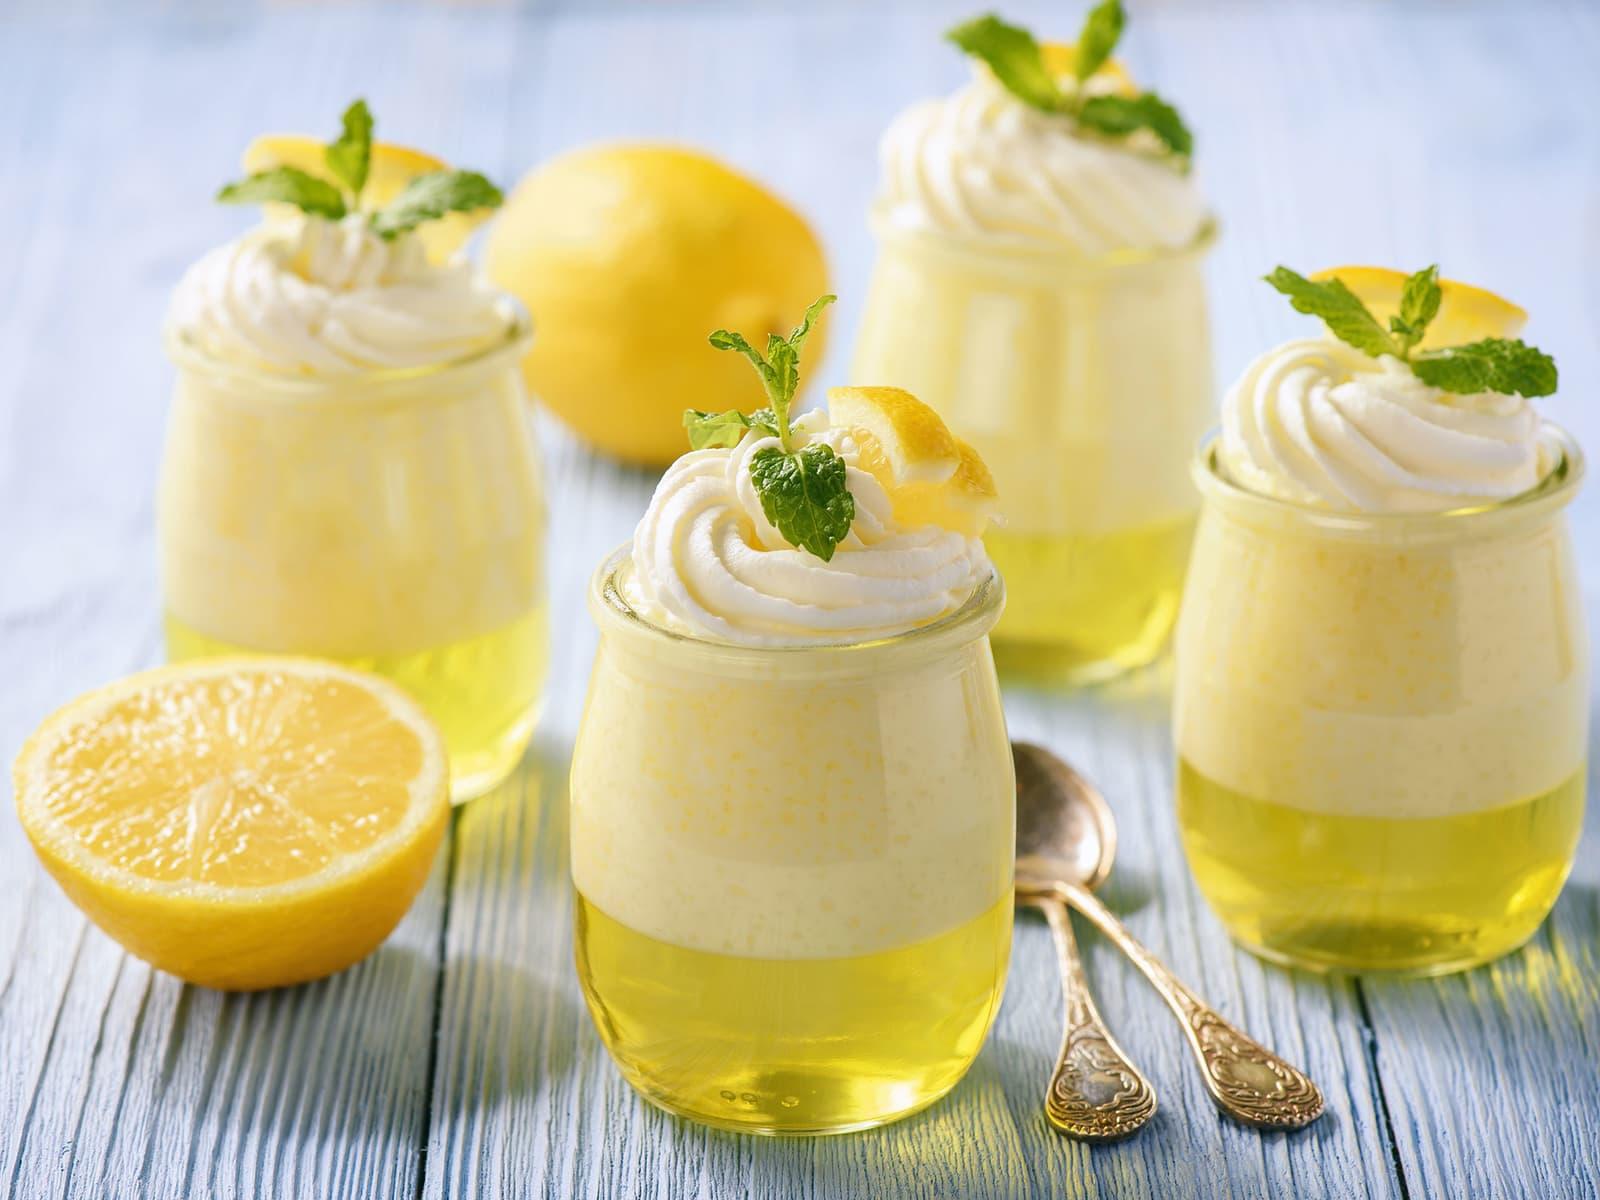 Sitrongele med sitronfromasj